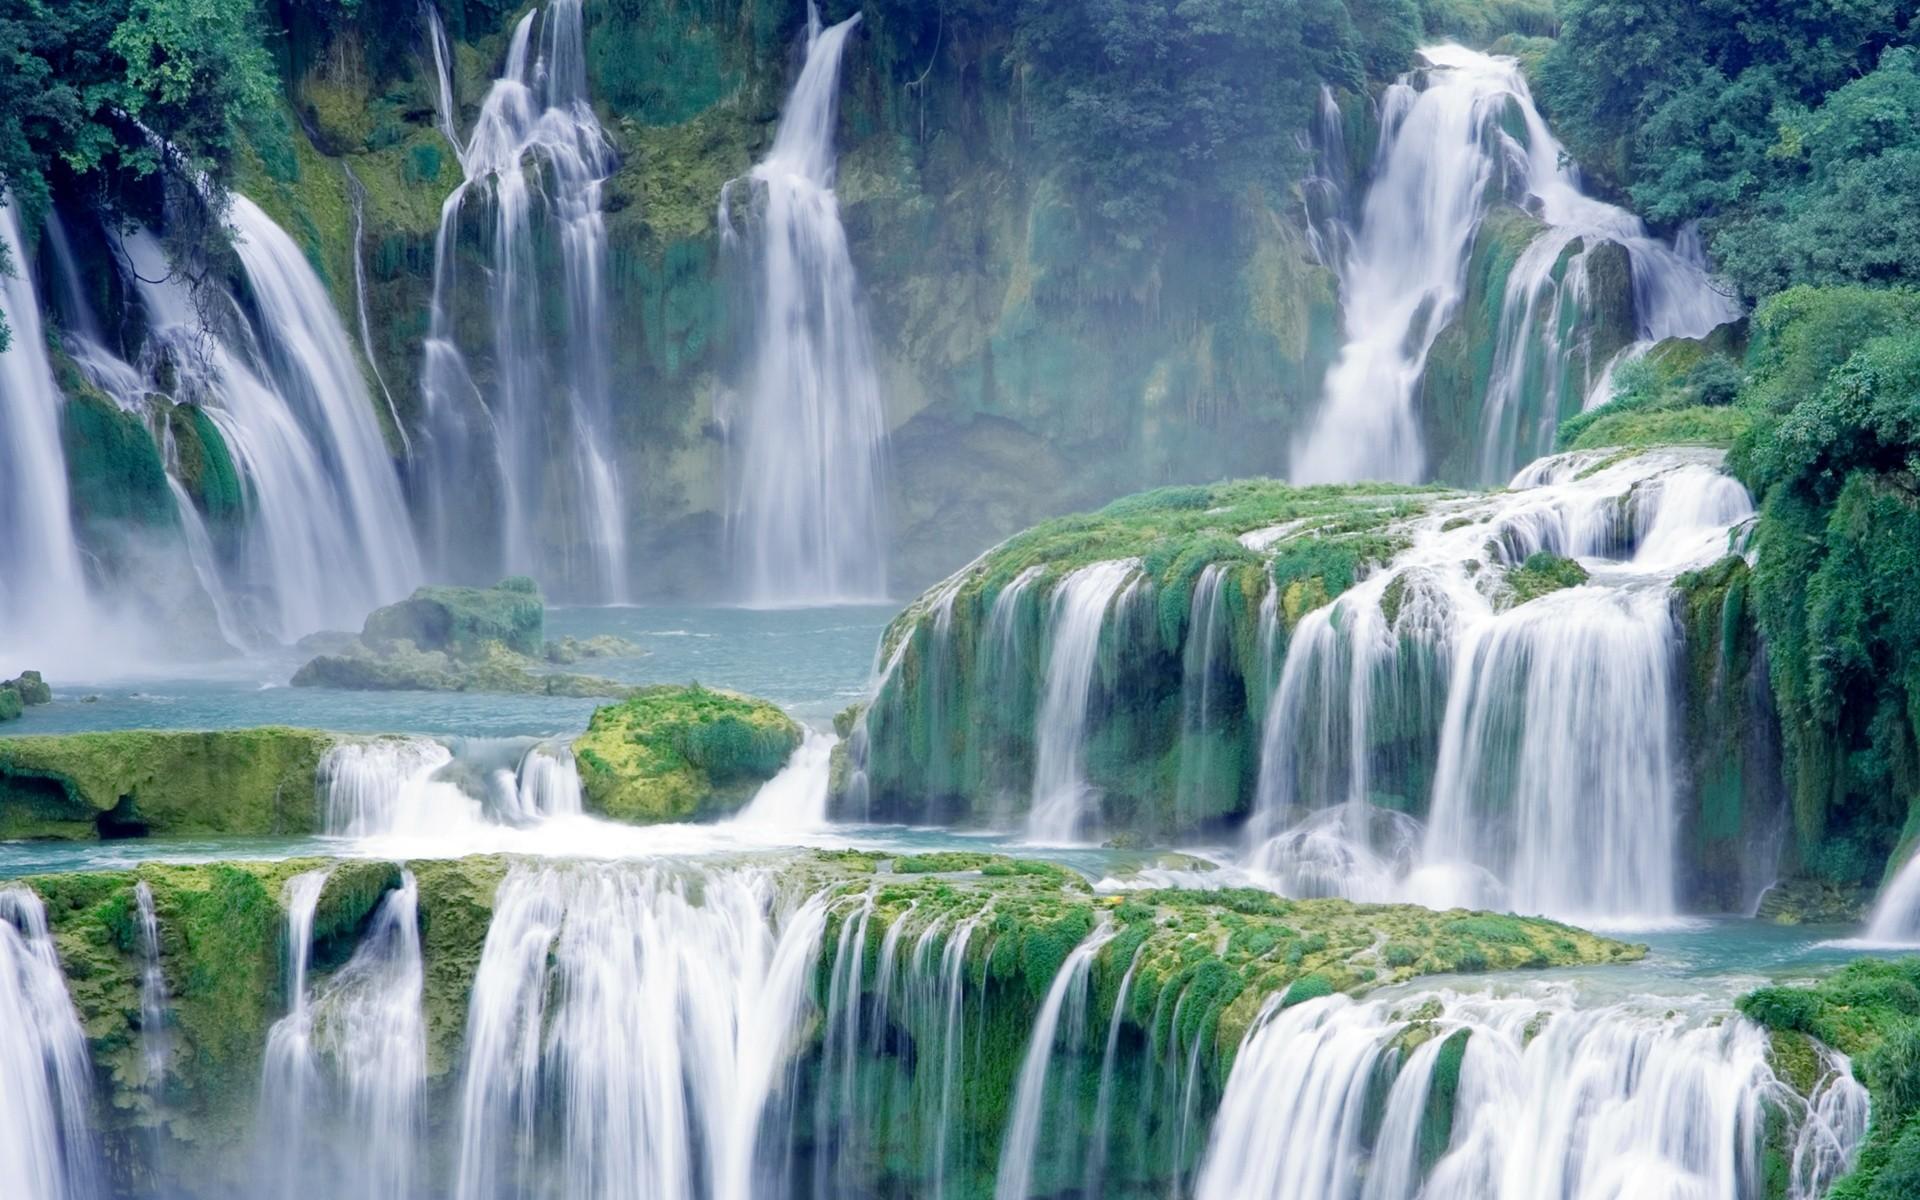 Waterfall | Amazing Green Waterfall wallpaper-Waterfall streams  wallpapers-#406